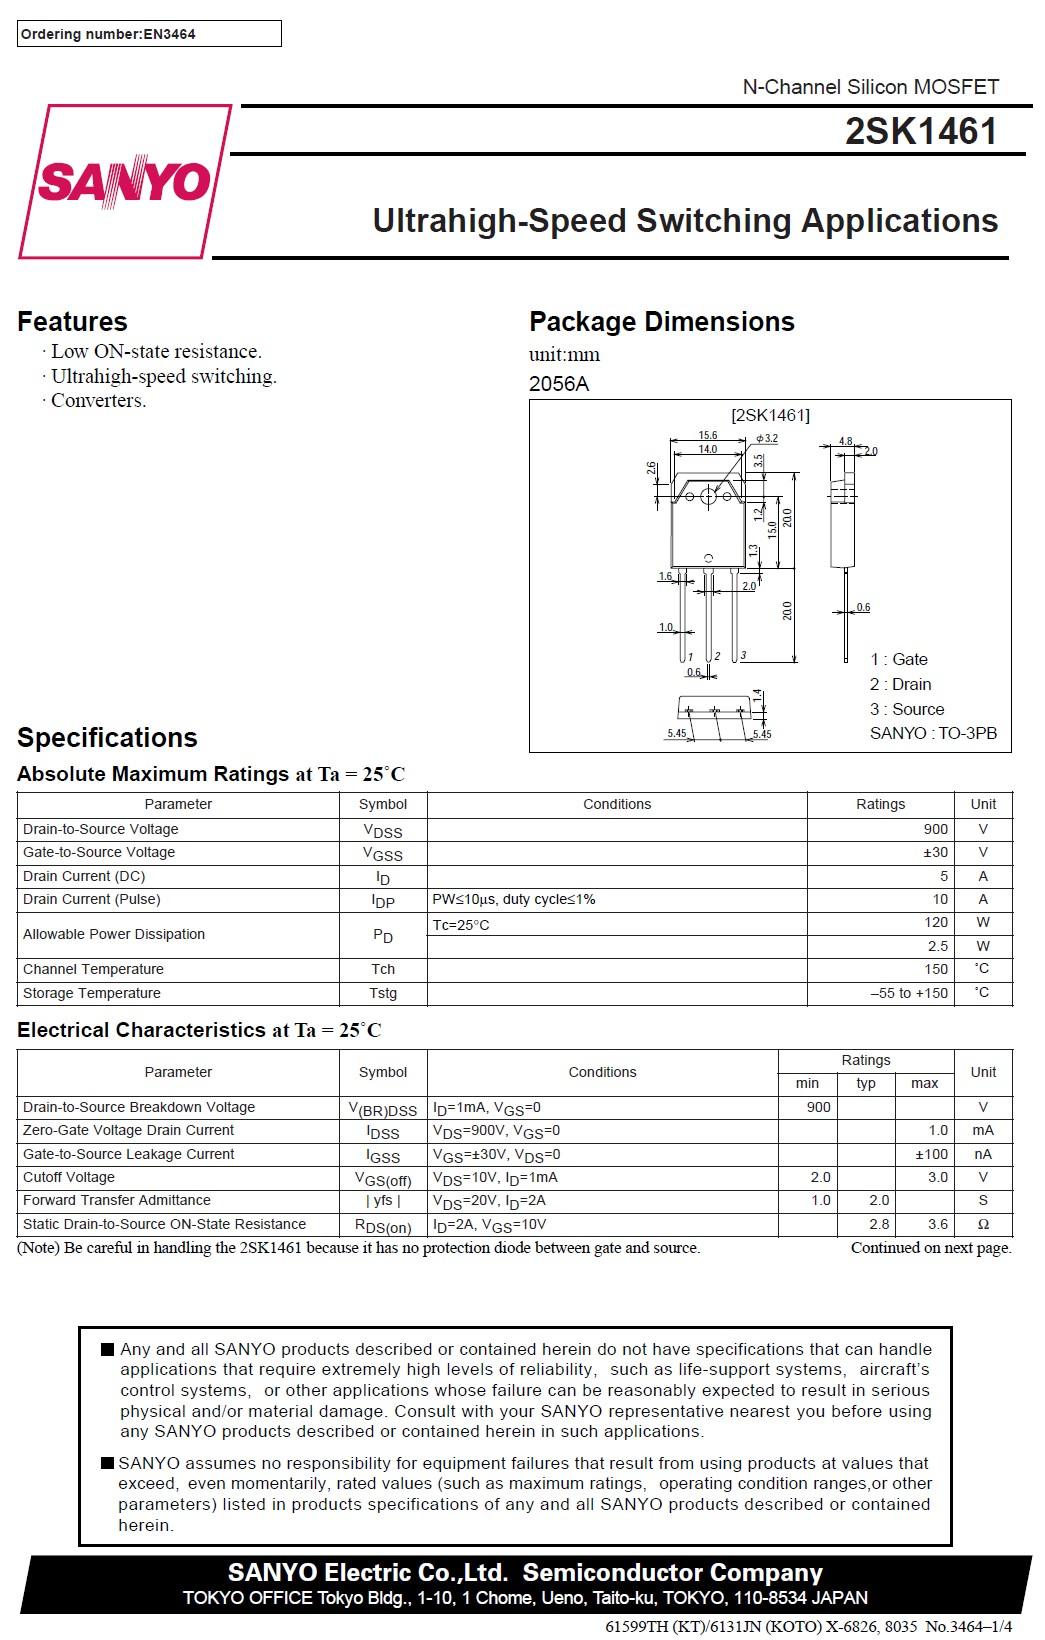 N-MOS 900V 5A 120W<3.6R(2A)S/L 2SK1461 -